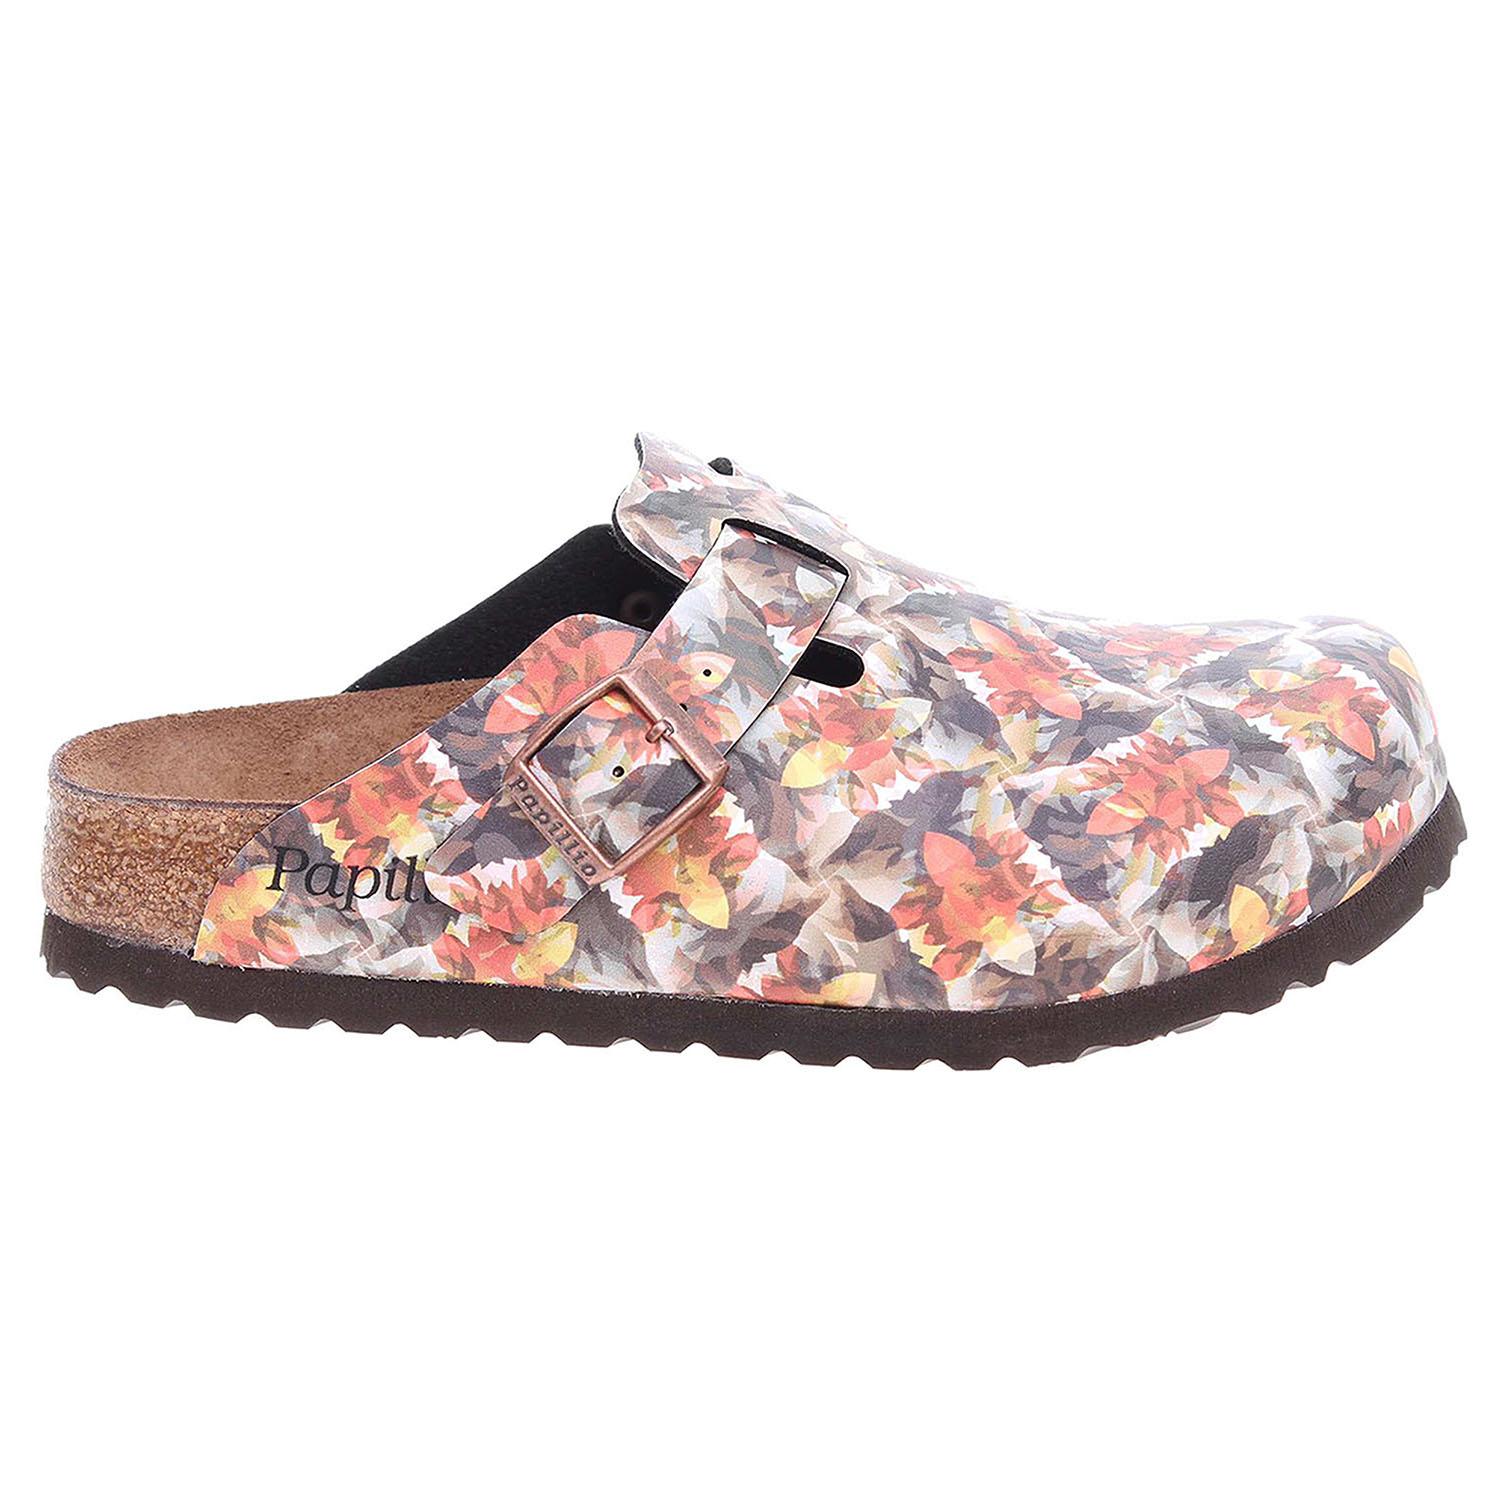 Papillio Boston dámské pantofle 1002326 hnědé 41